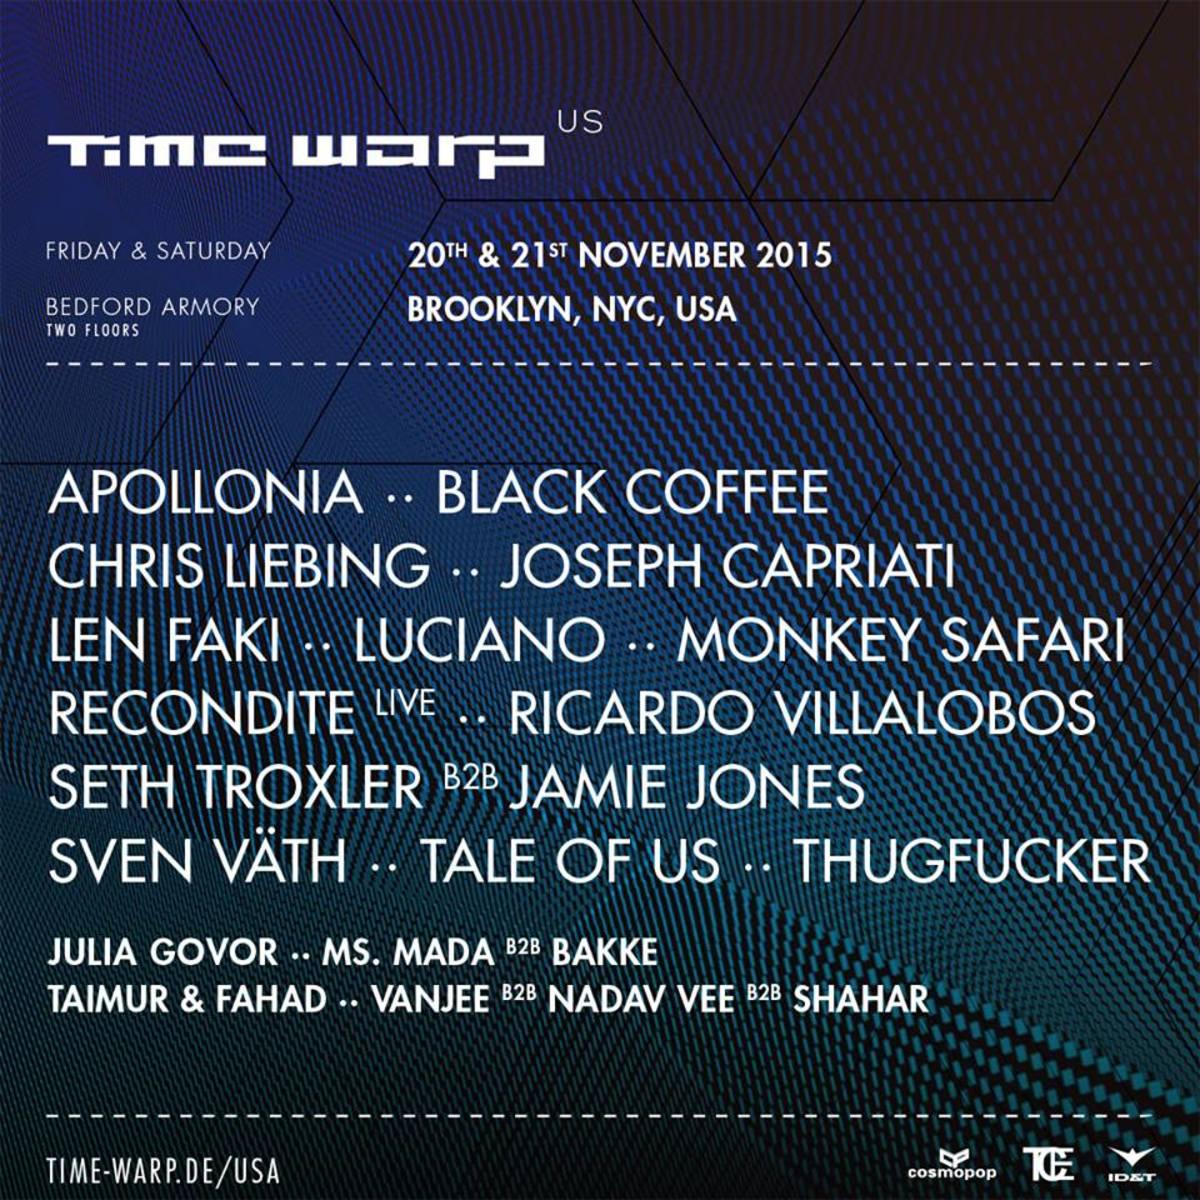 time warp lineup